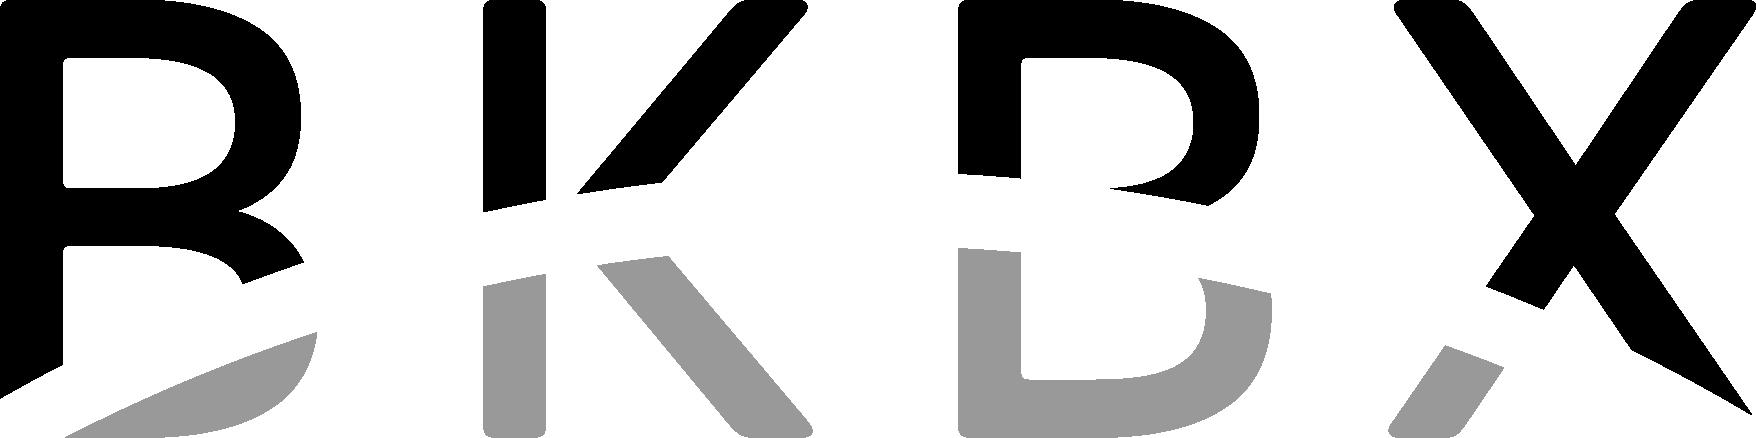 BKBX Dark Lockup (1).png